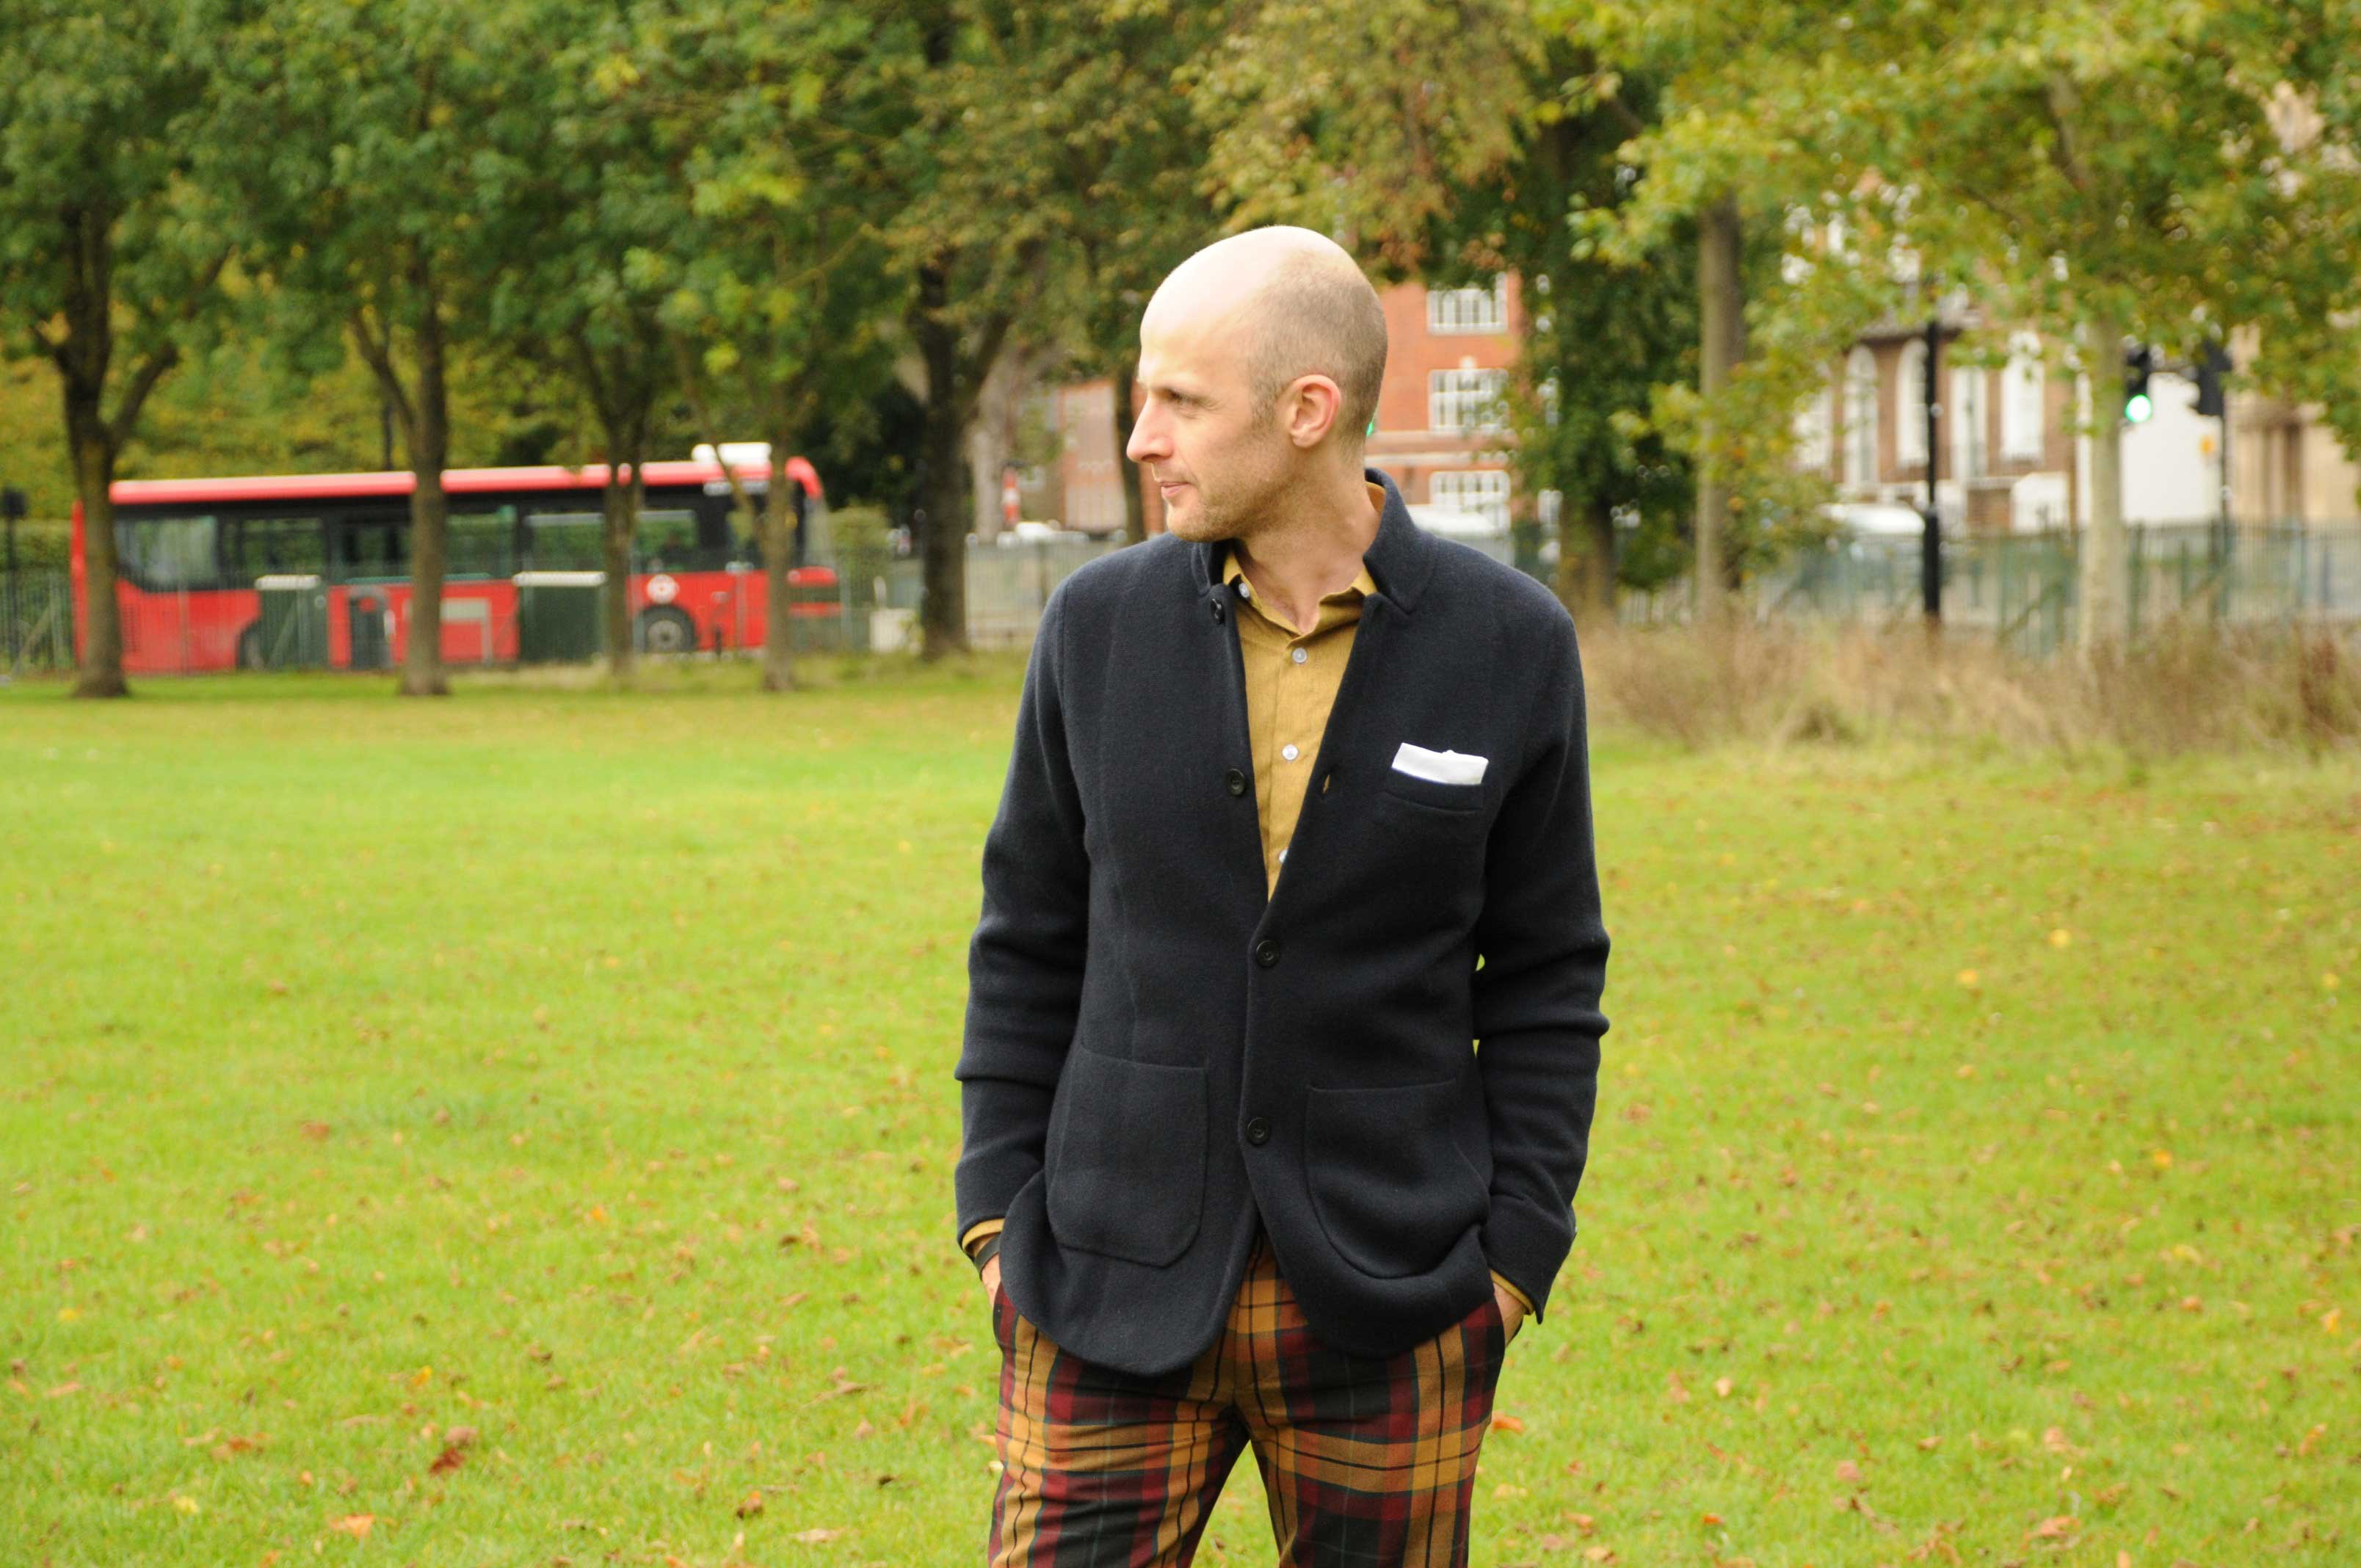 N.peal cashmere jacket james bond goldfinger me standing in a park